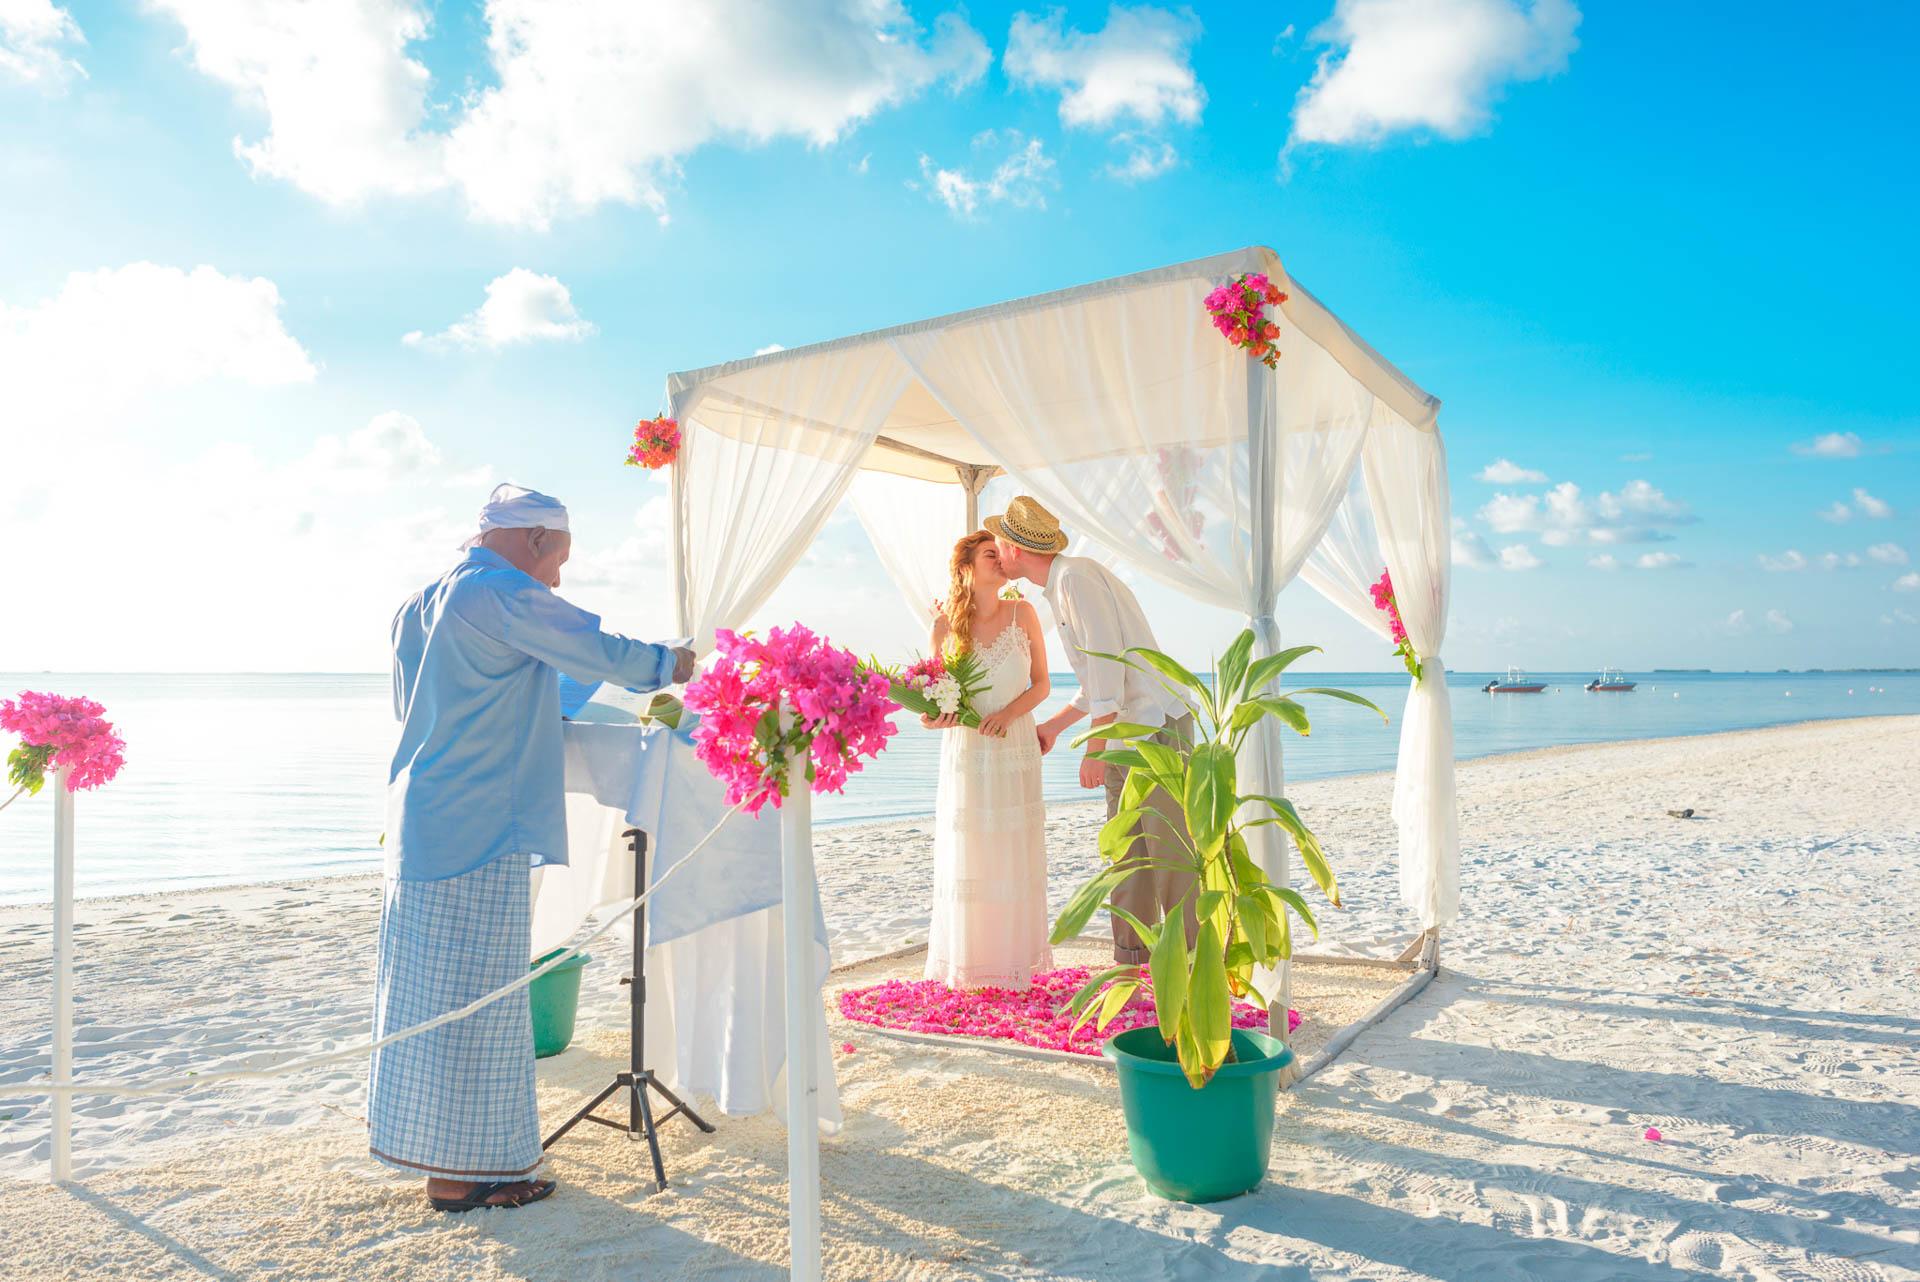 Heike Michaels Beach Wedding in Maldives 24